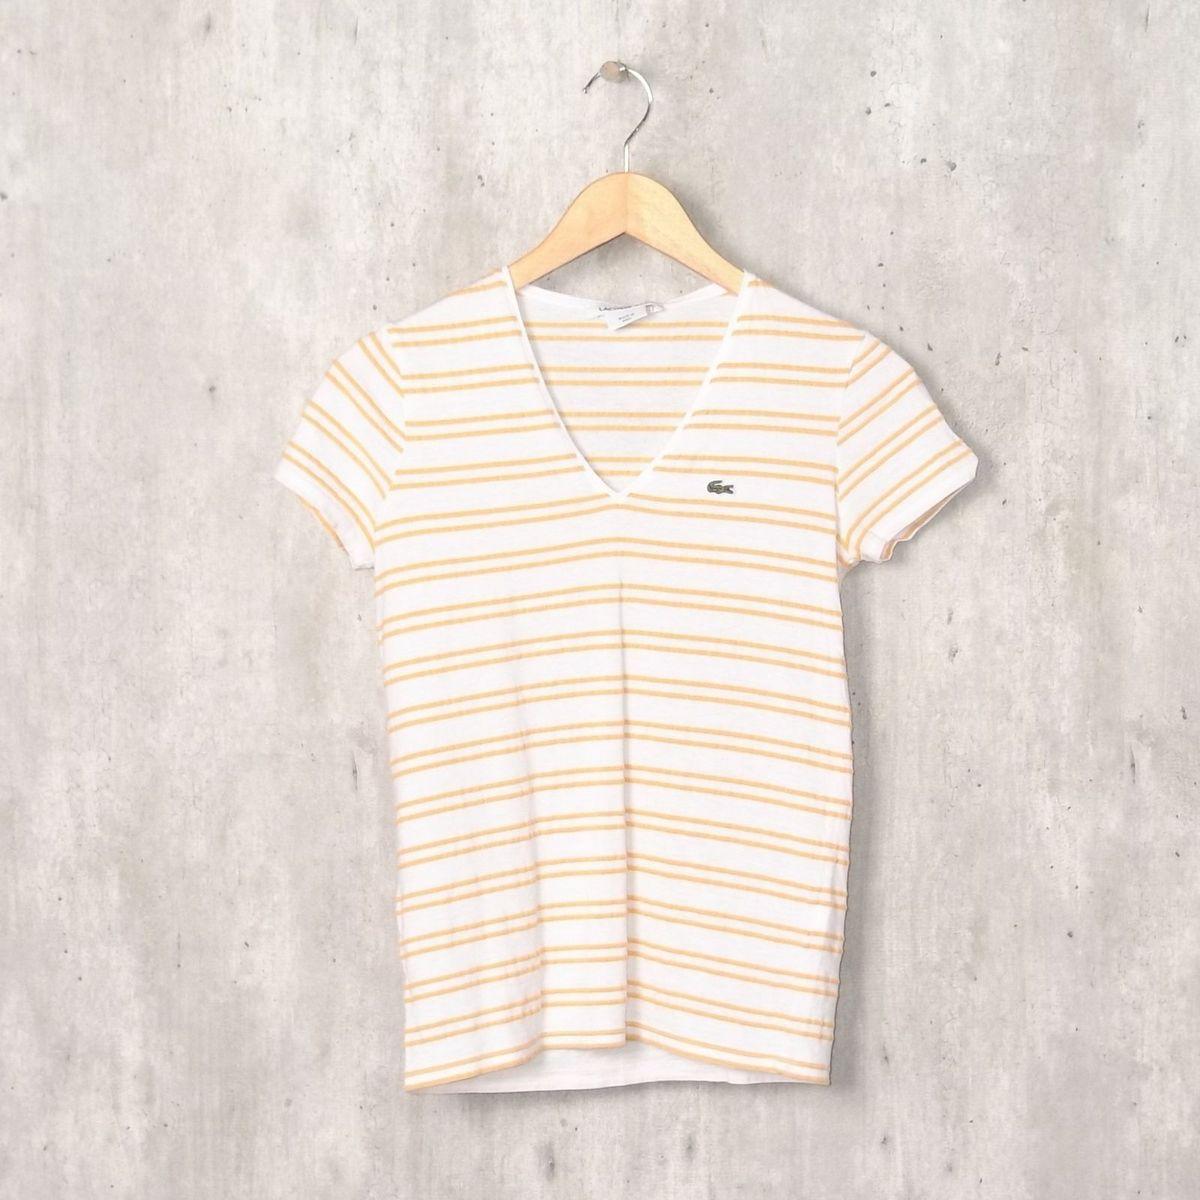 blusa branca listrada lacoste - blusas lacoste.  Czm6ly9wag90b3muzw5qb2vplmnvbs5ici9wcm9kdwn0cy83mzk0mtqxl2ningfiywi0mtq2ntnjnwjlywqxnjc5mda1ndu1nguwlmpwzw  ... a24ddddcb2